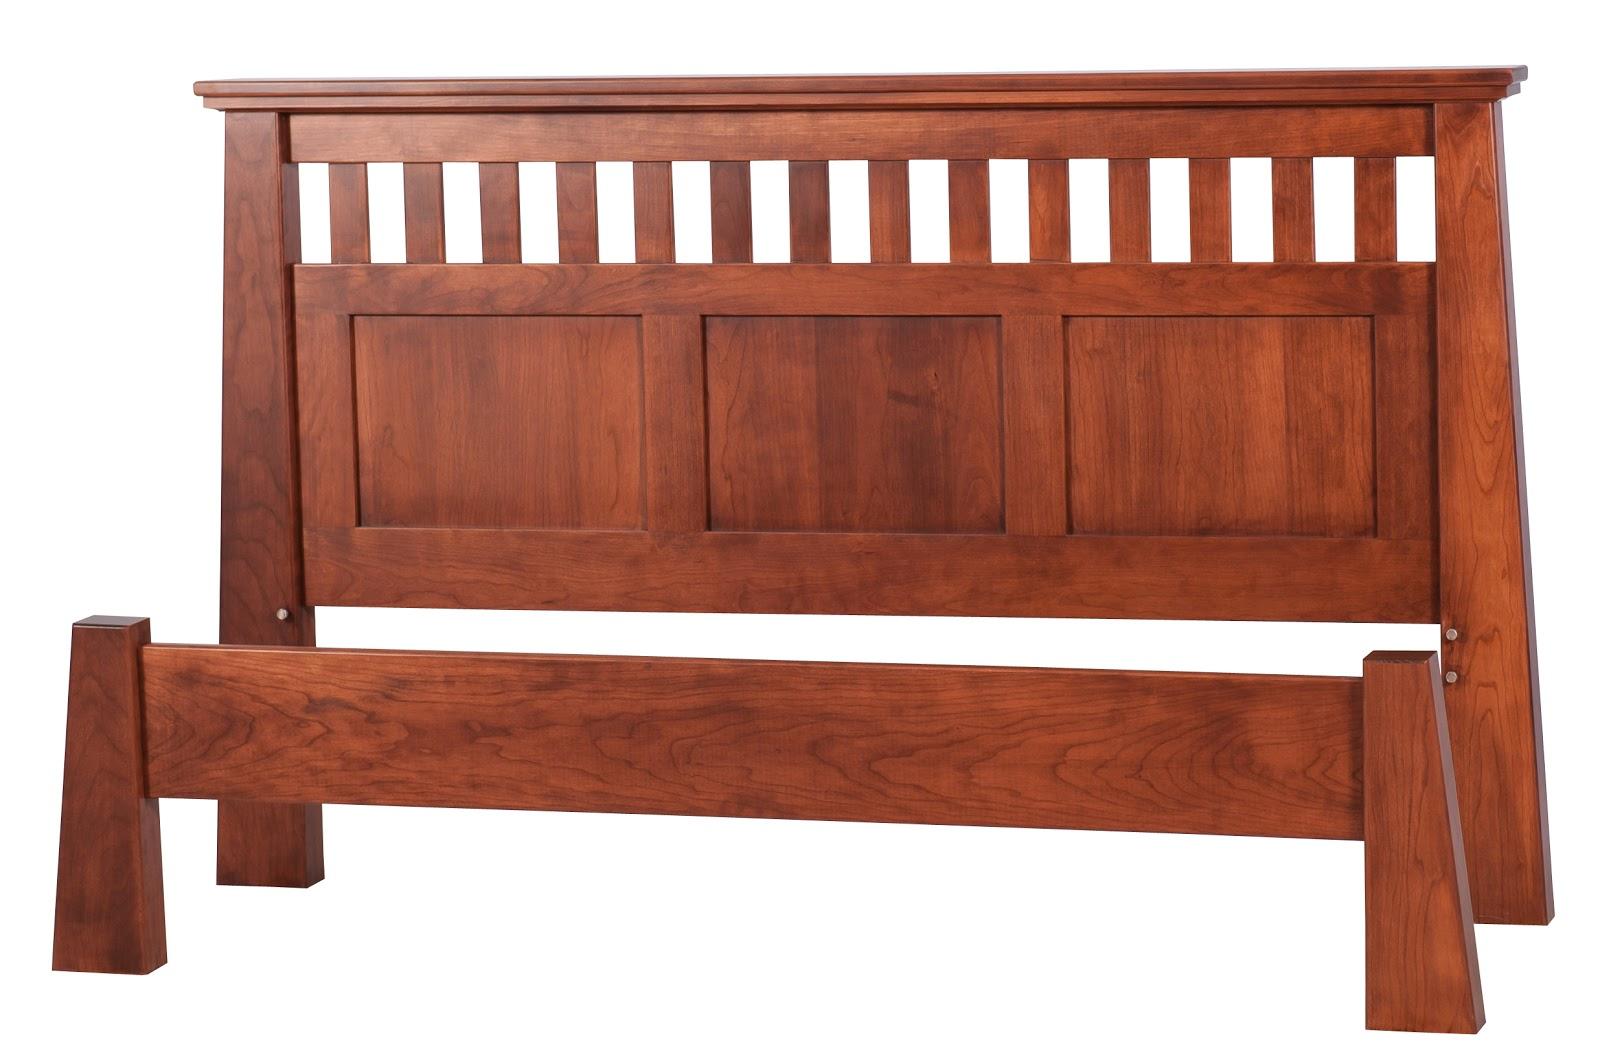 teton platform bed solid wood platform bed in the teton styl